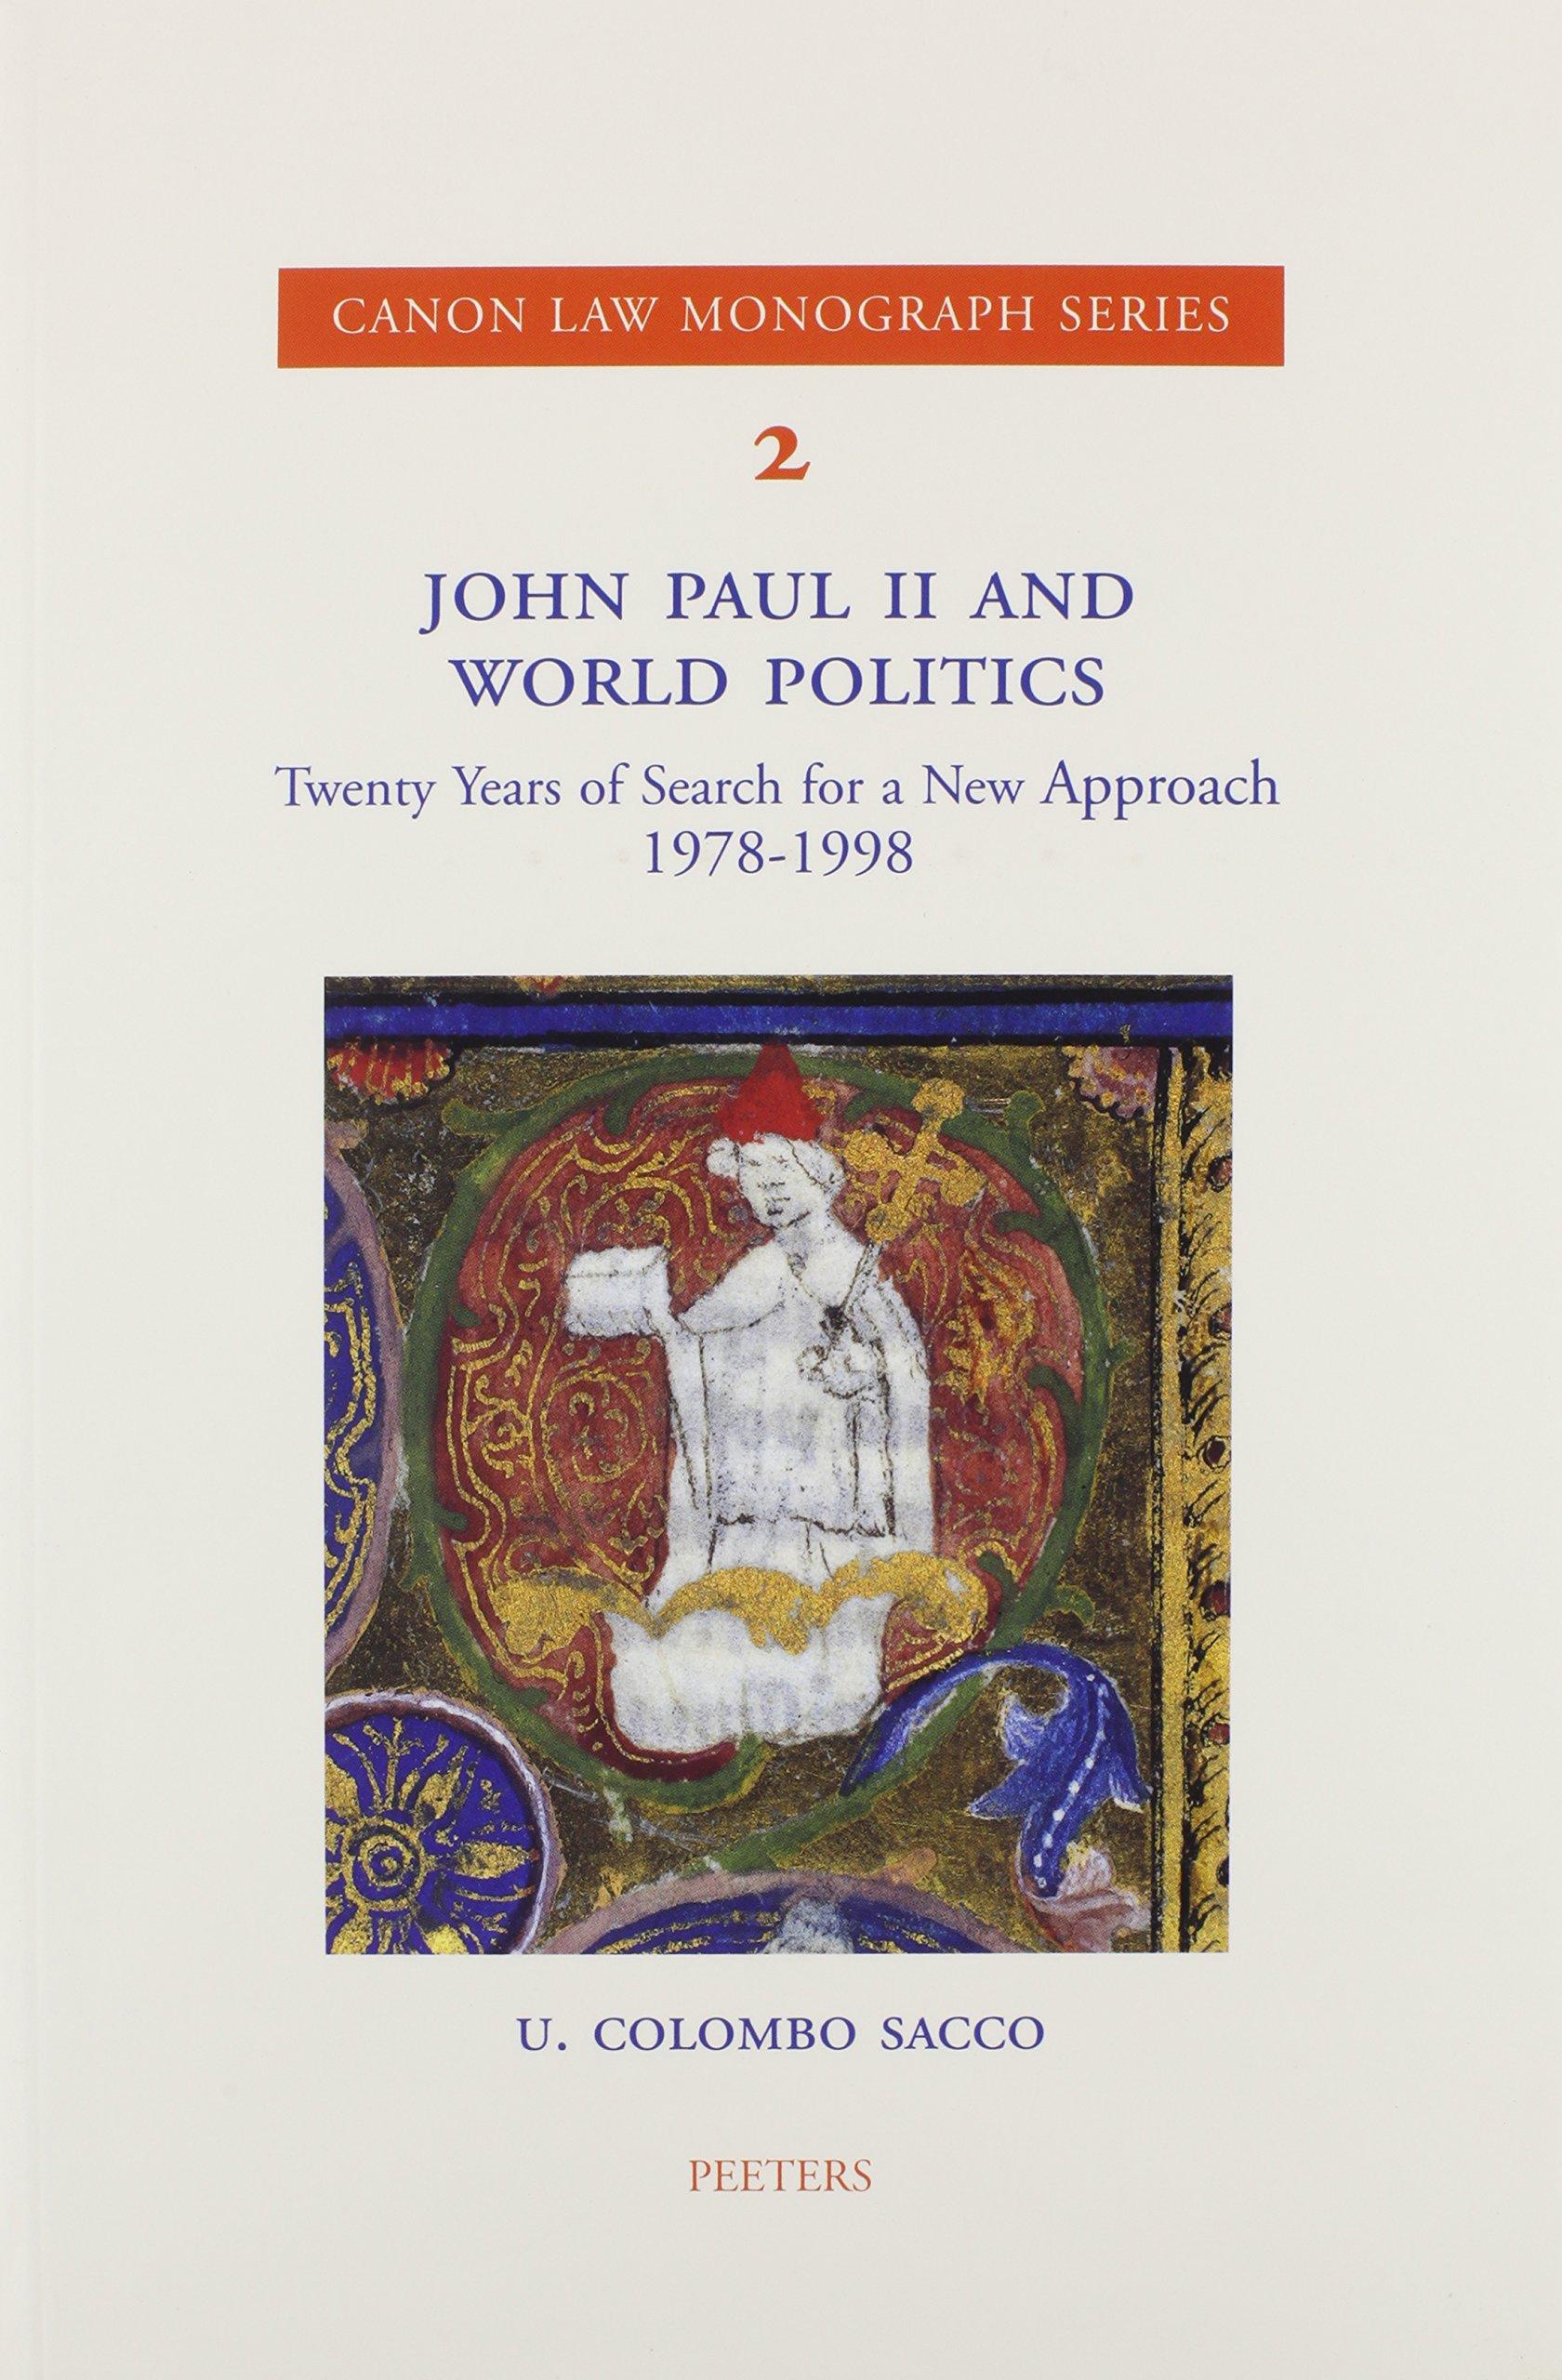 John Paul II and World Politics Twenty Years of